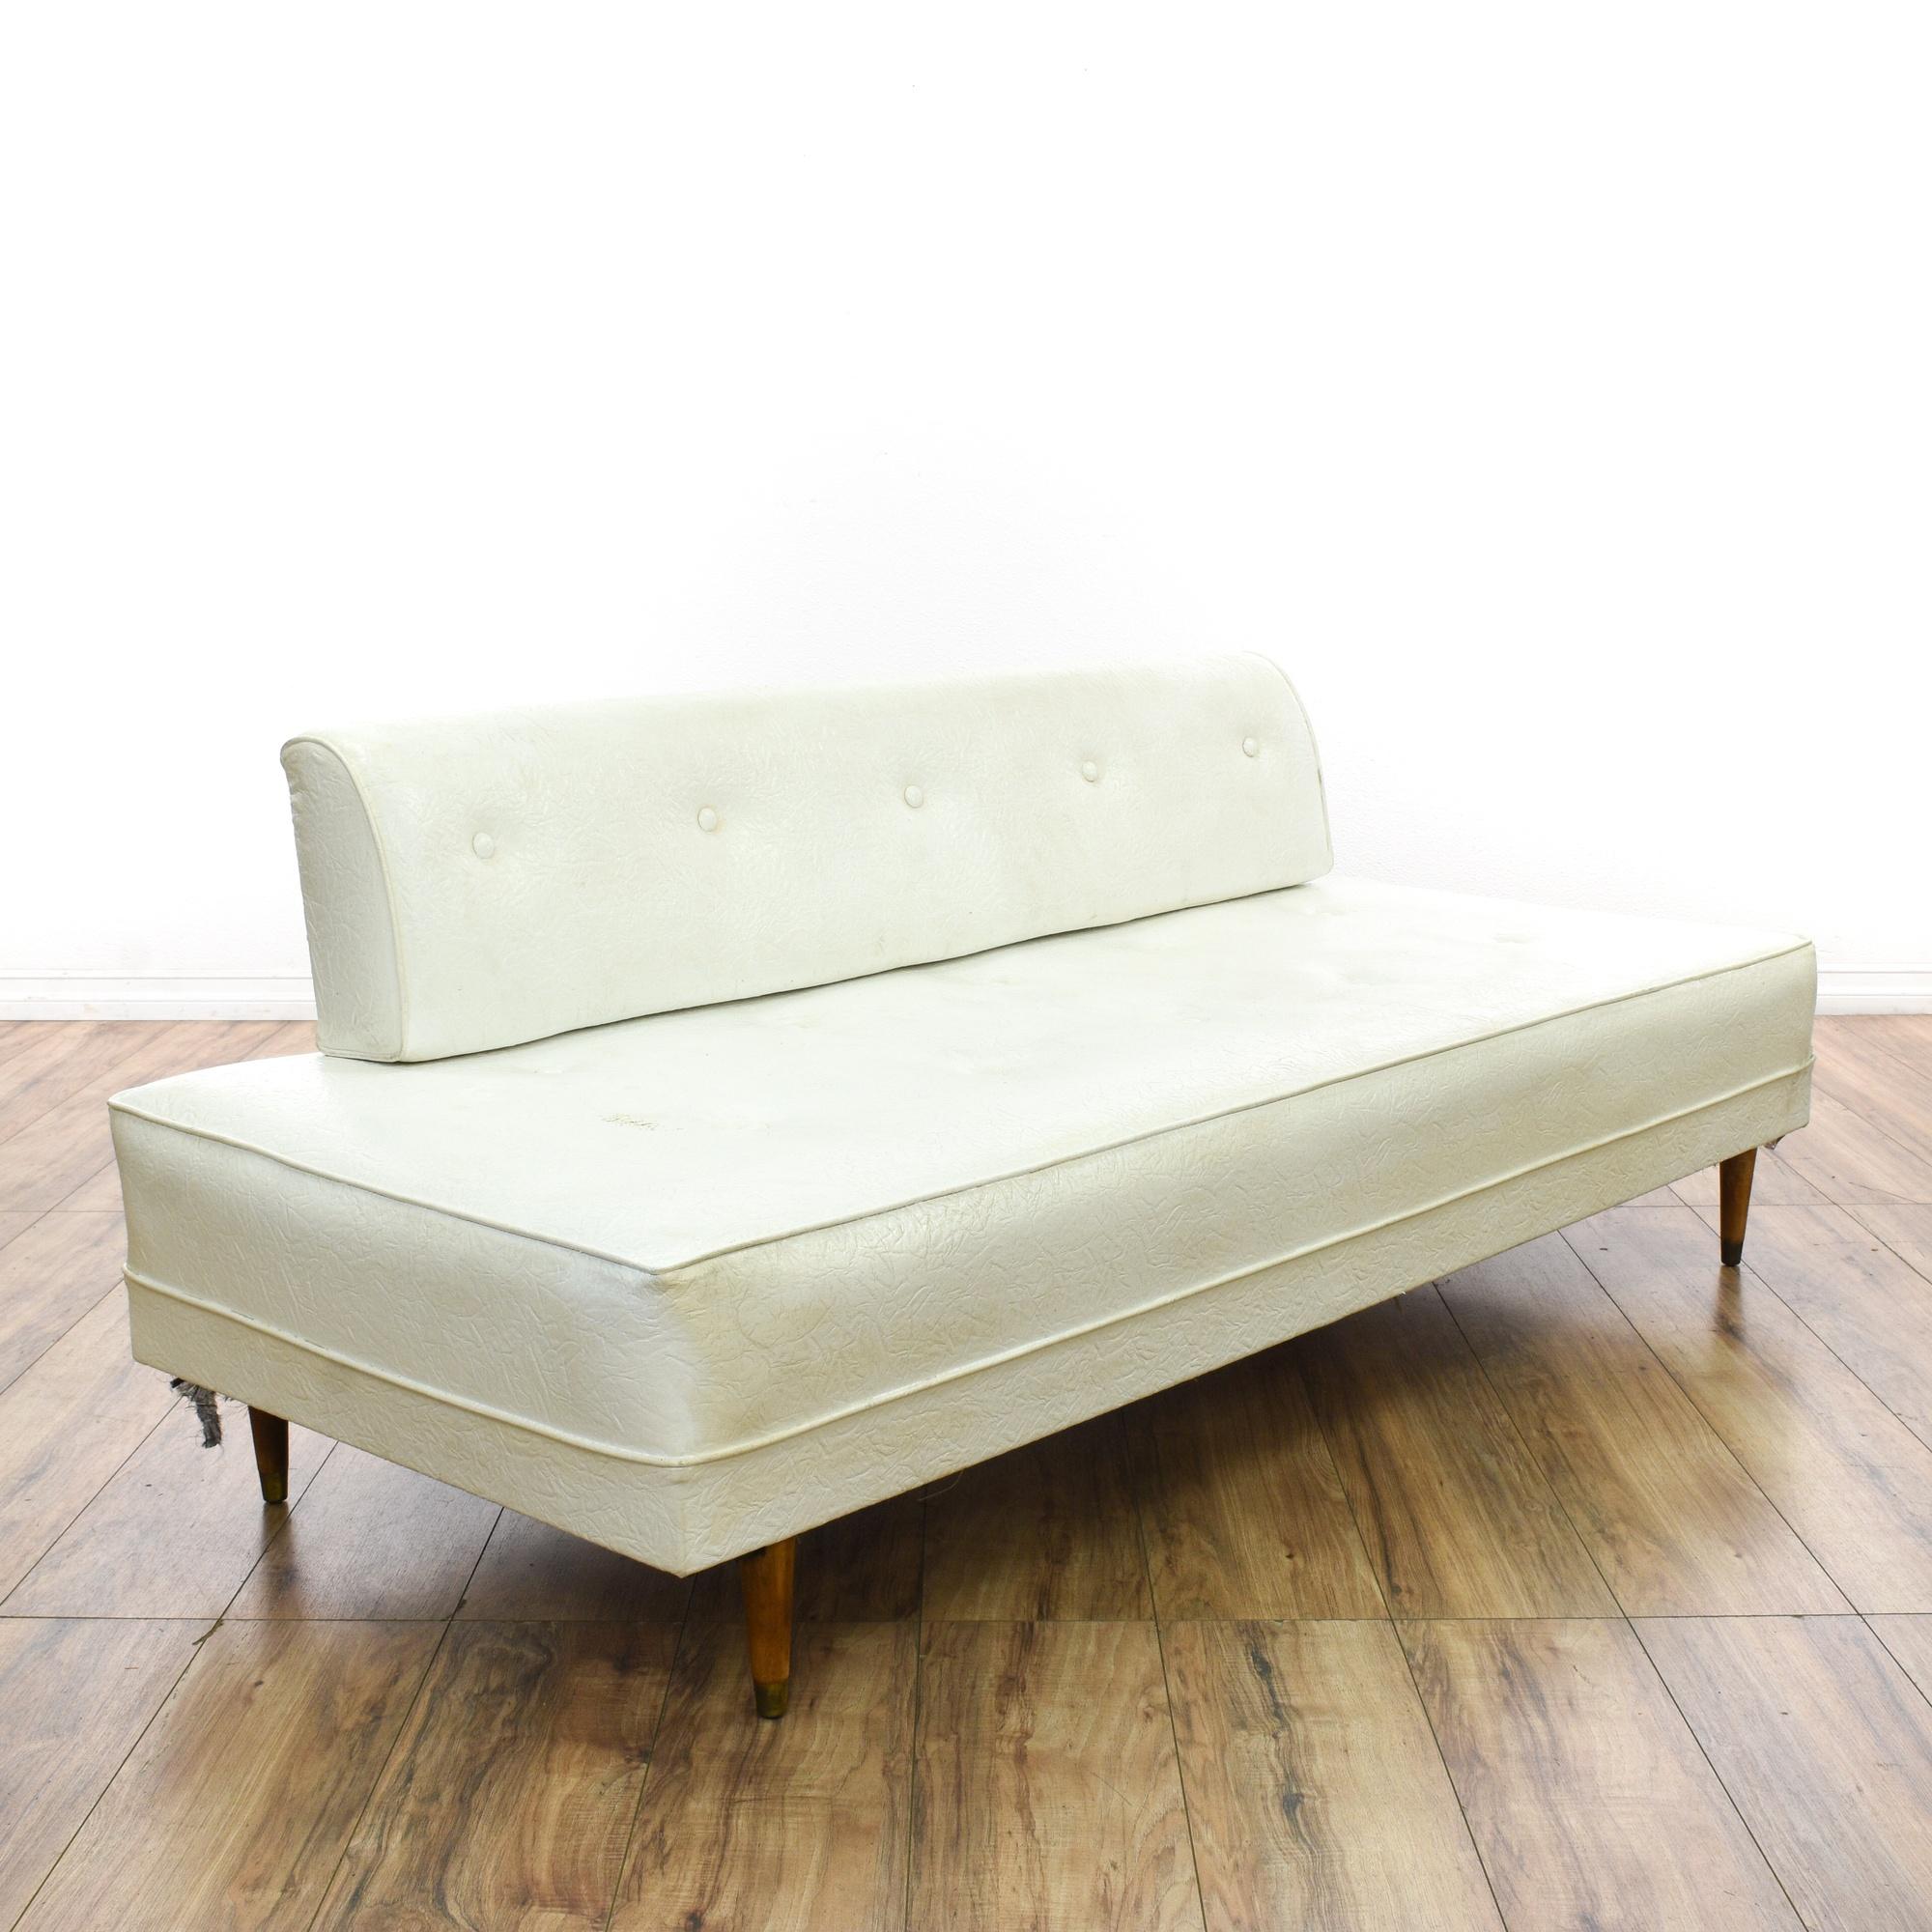 Mid century modern white vinyl daybed sofa loveseat for Mid century daybed sofa